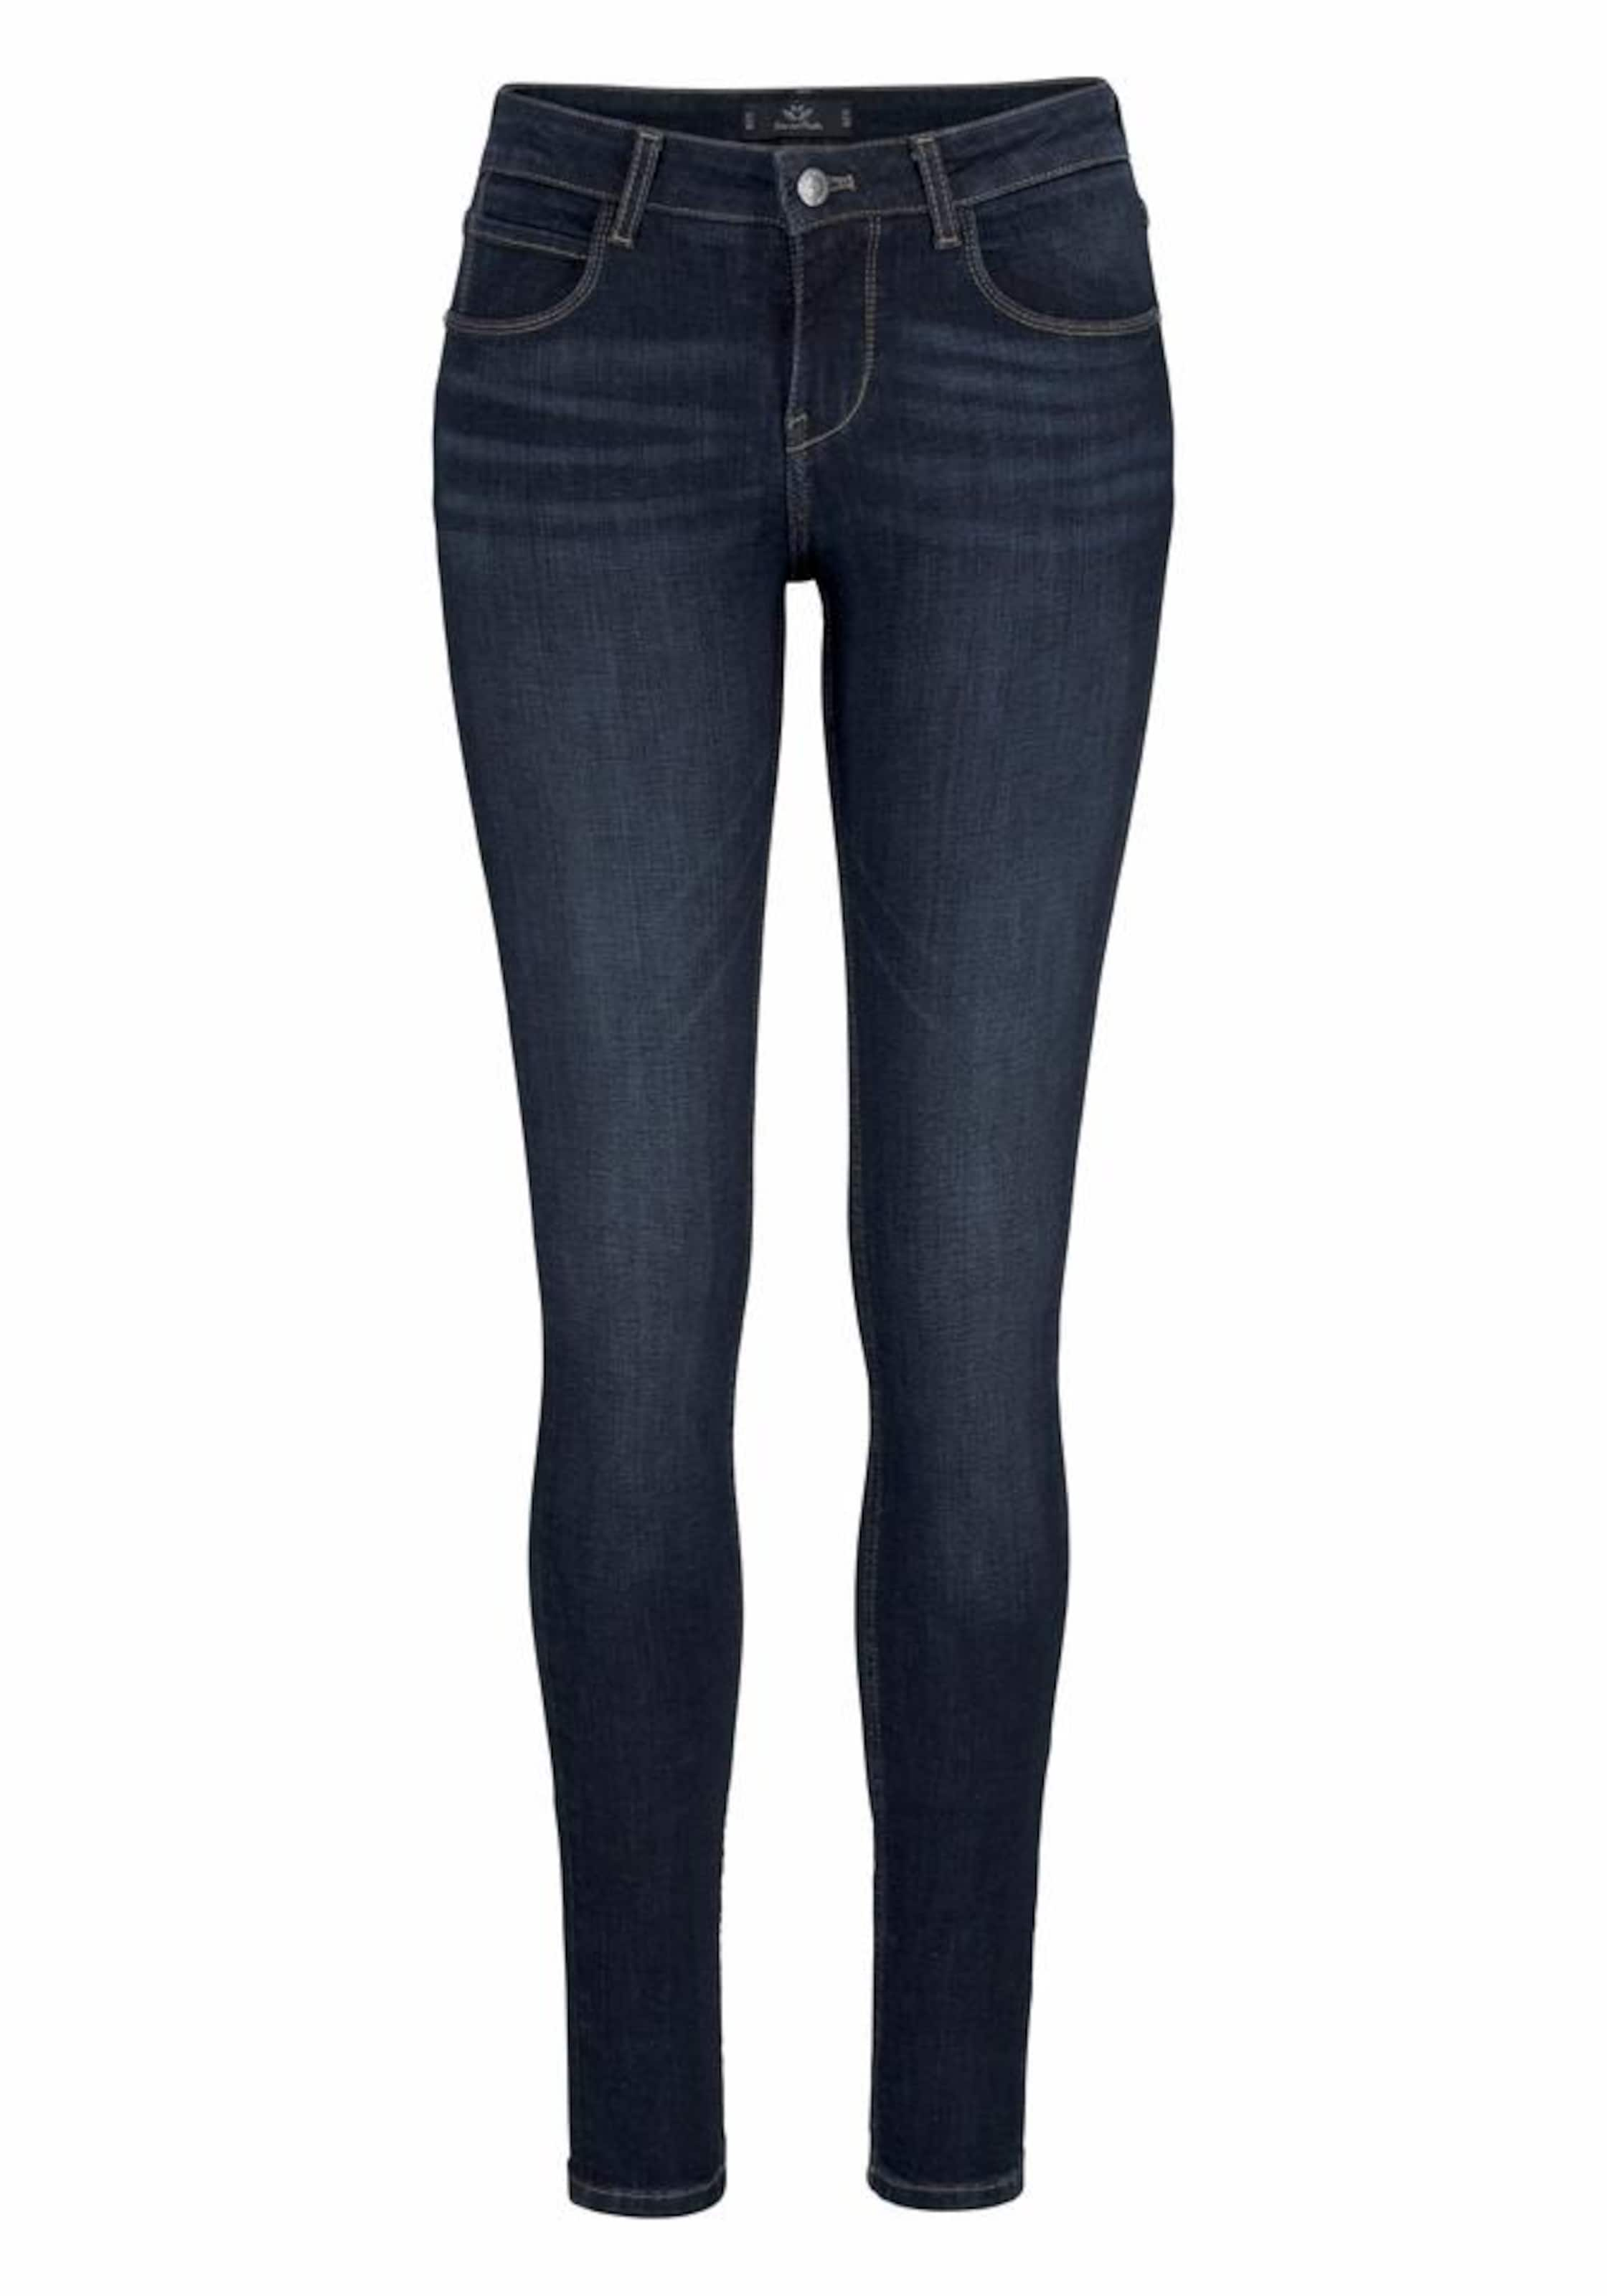 Aus Jeans Fritzi In Blau Preußen 'downey' tdCrQsh